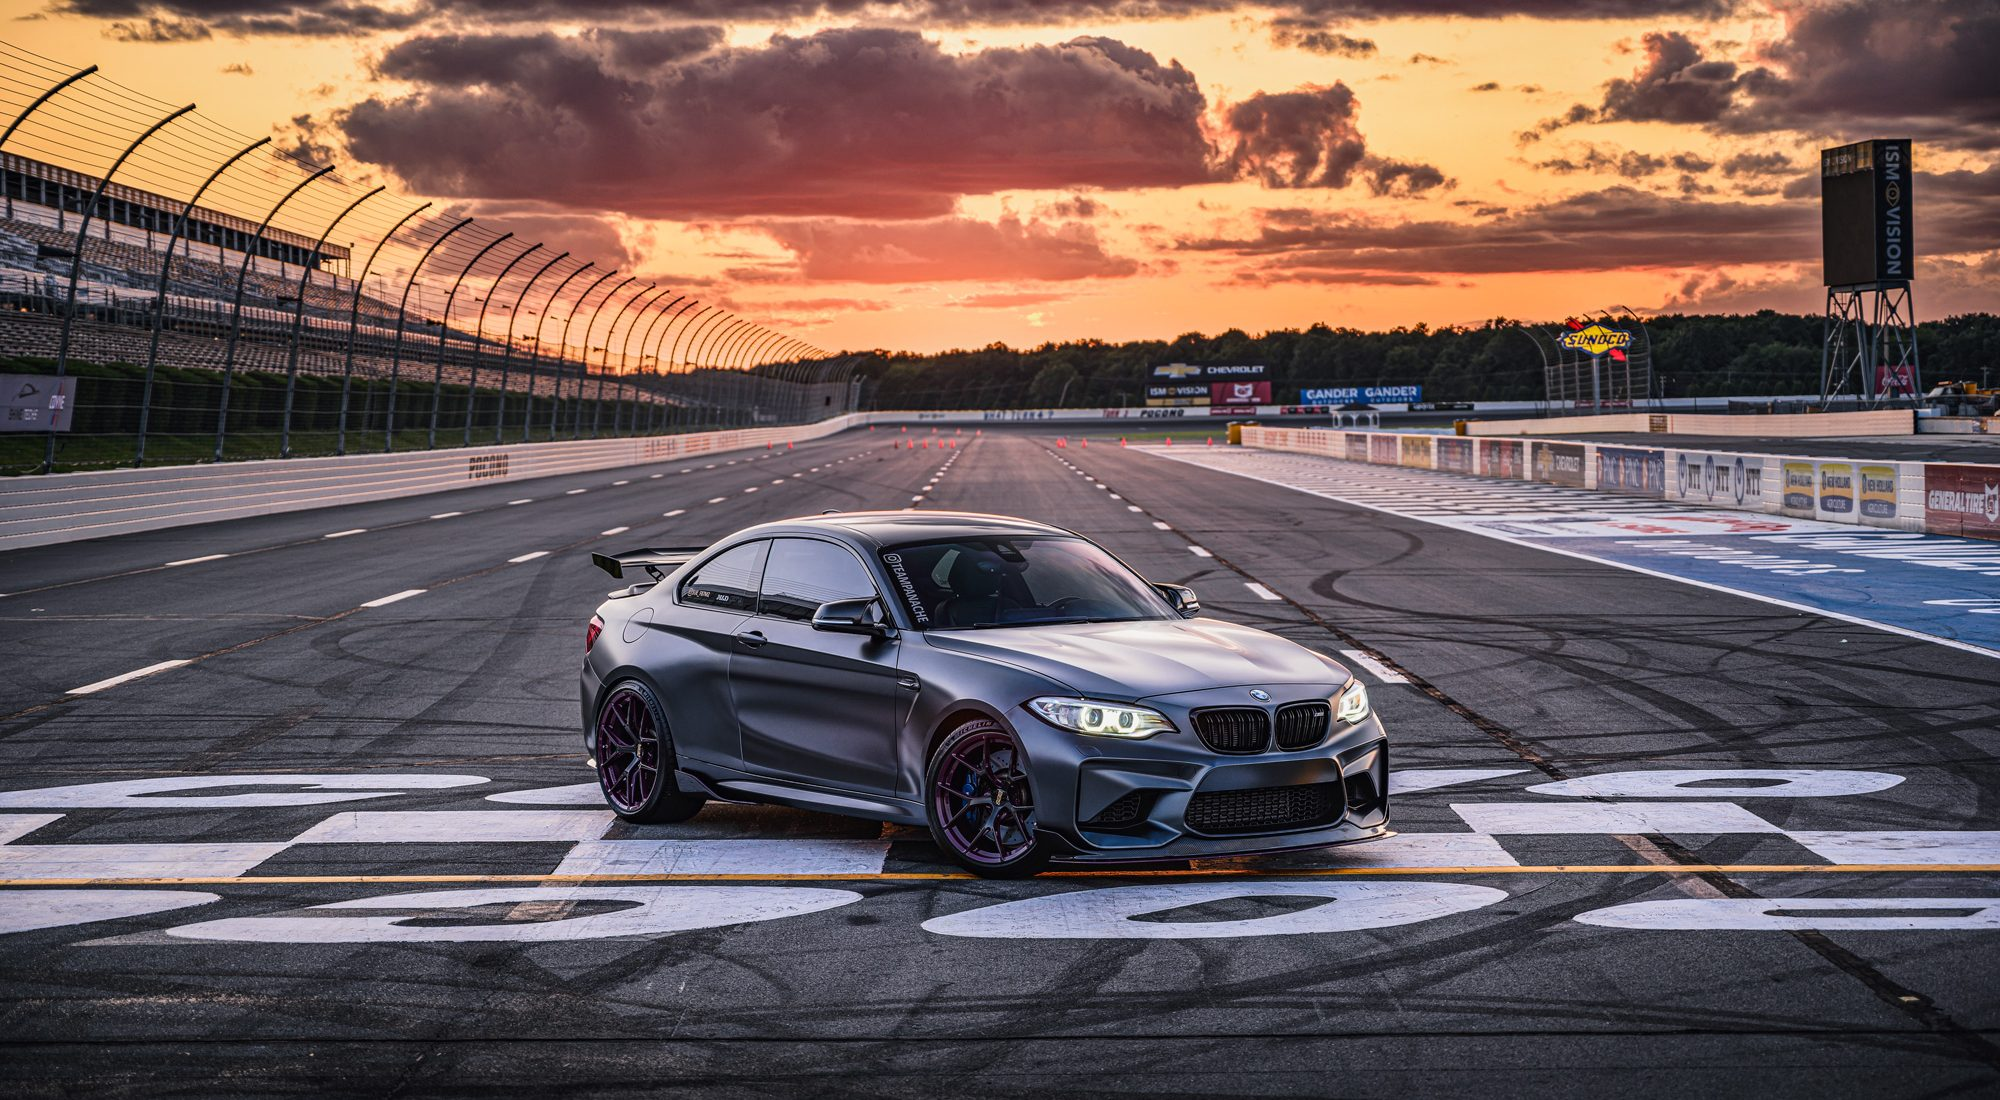 Tutorial: How I shot the BMW M2 at Pocono Raceway